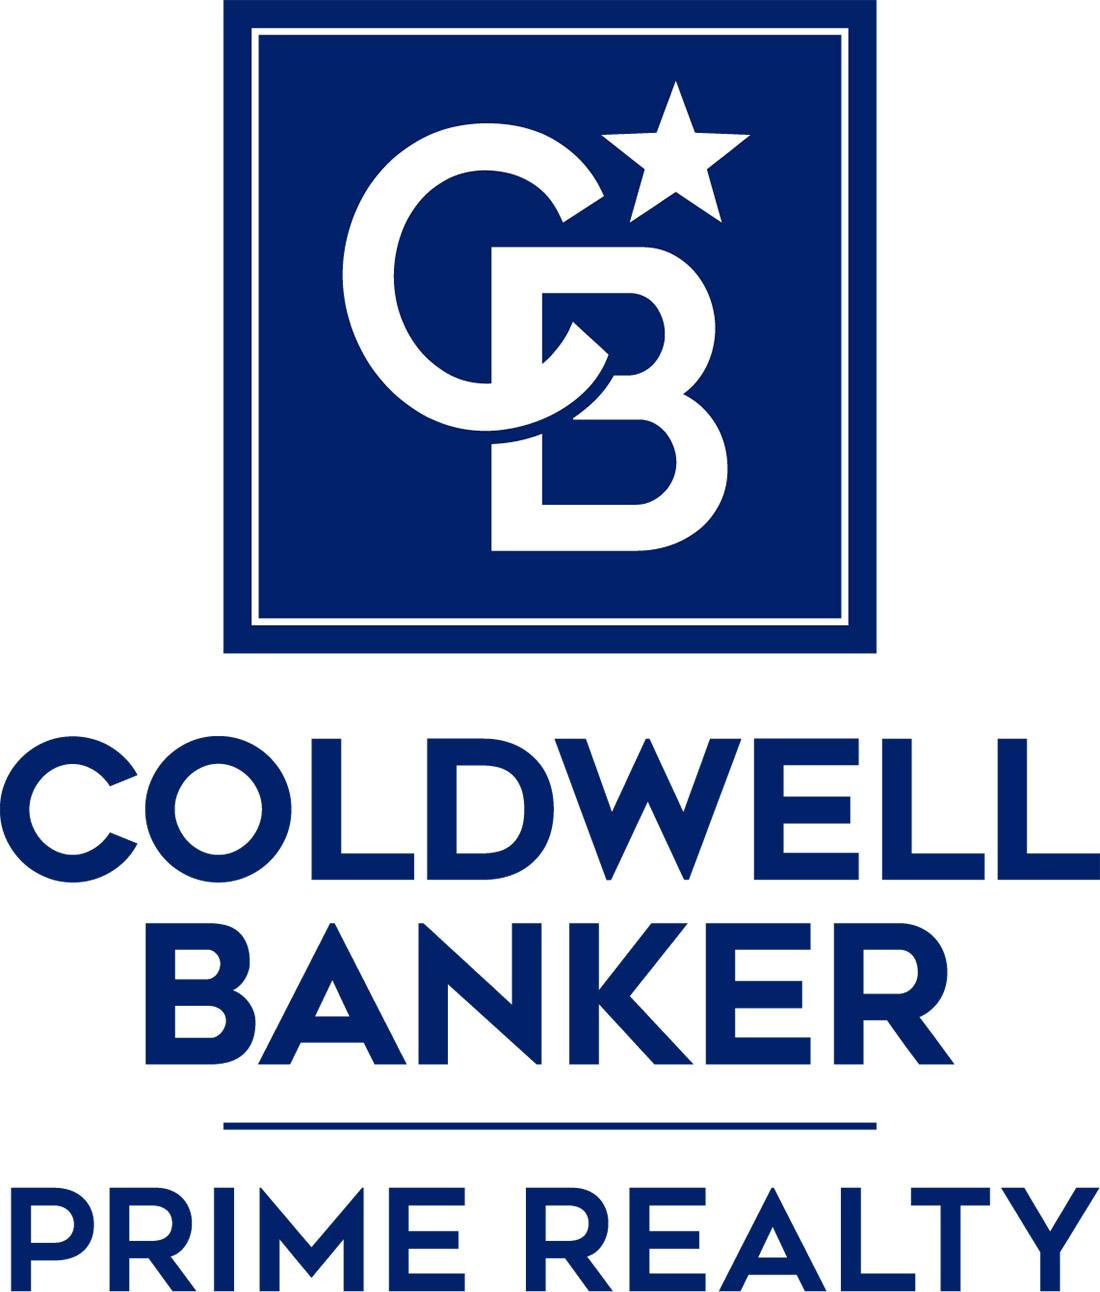 Scott Kinkelaar - Coldwell Banker Prime Realty - Carbondale, IL Logo